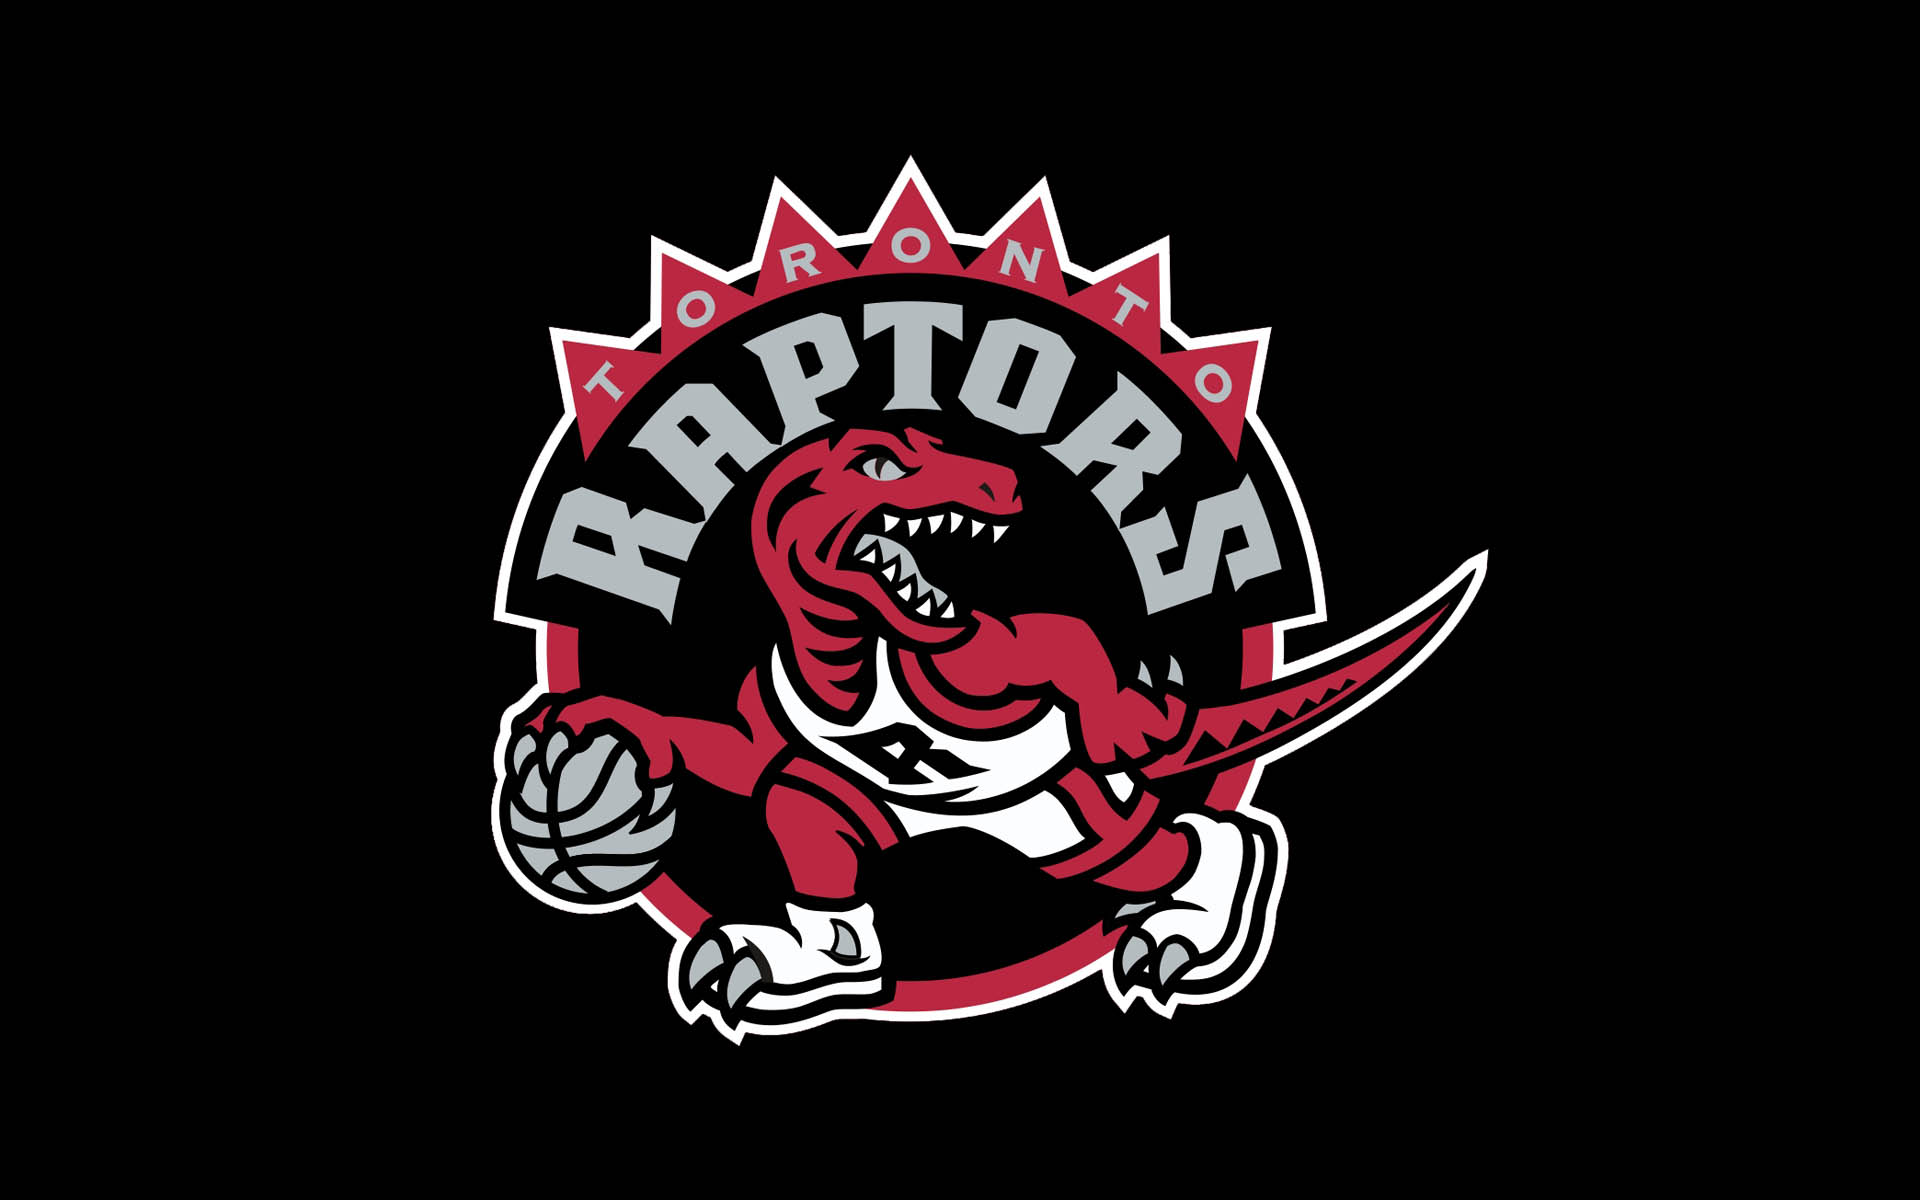 Basketball Nba Toronto Raptors Wallpaper 1920x1200 43534